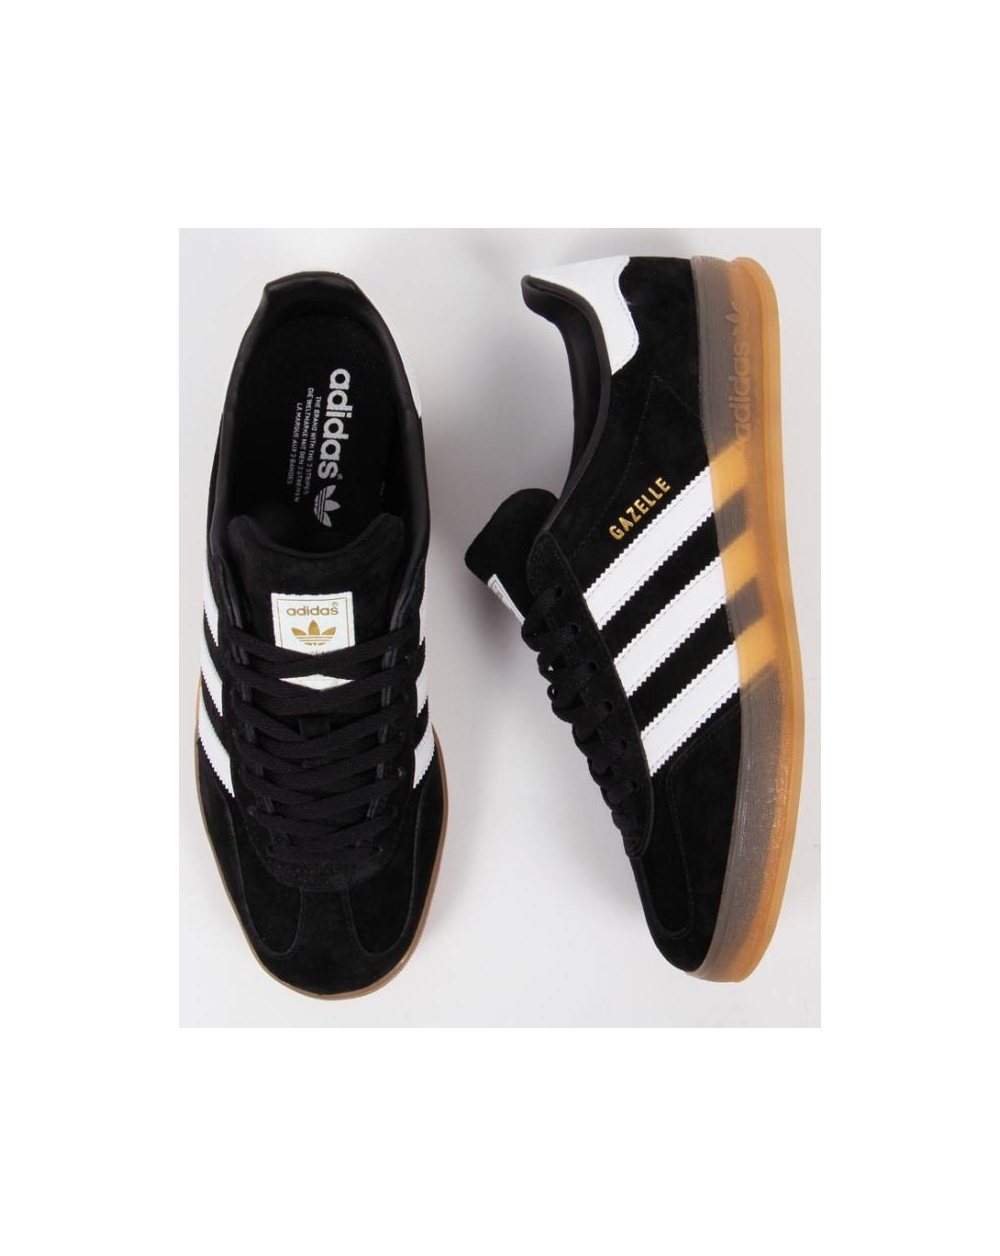 mens adidas black & white gazelle indoor trainers